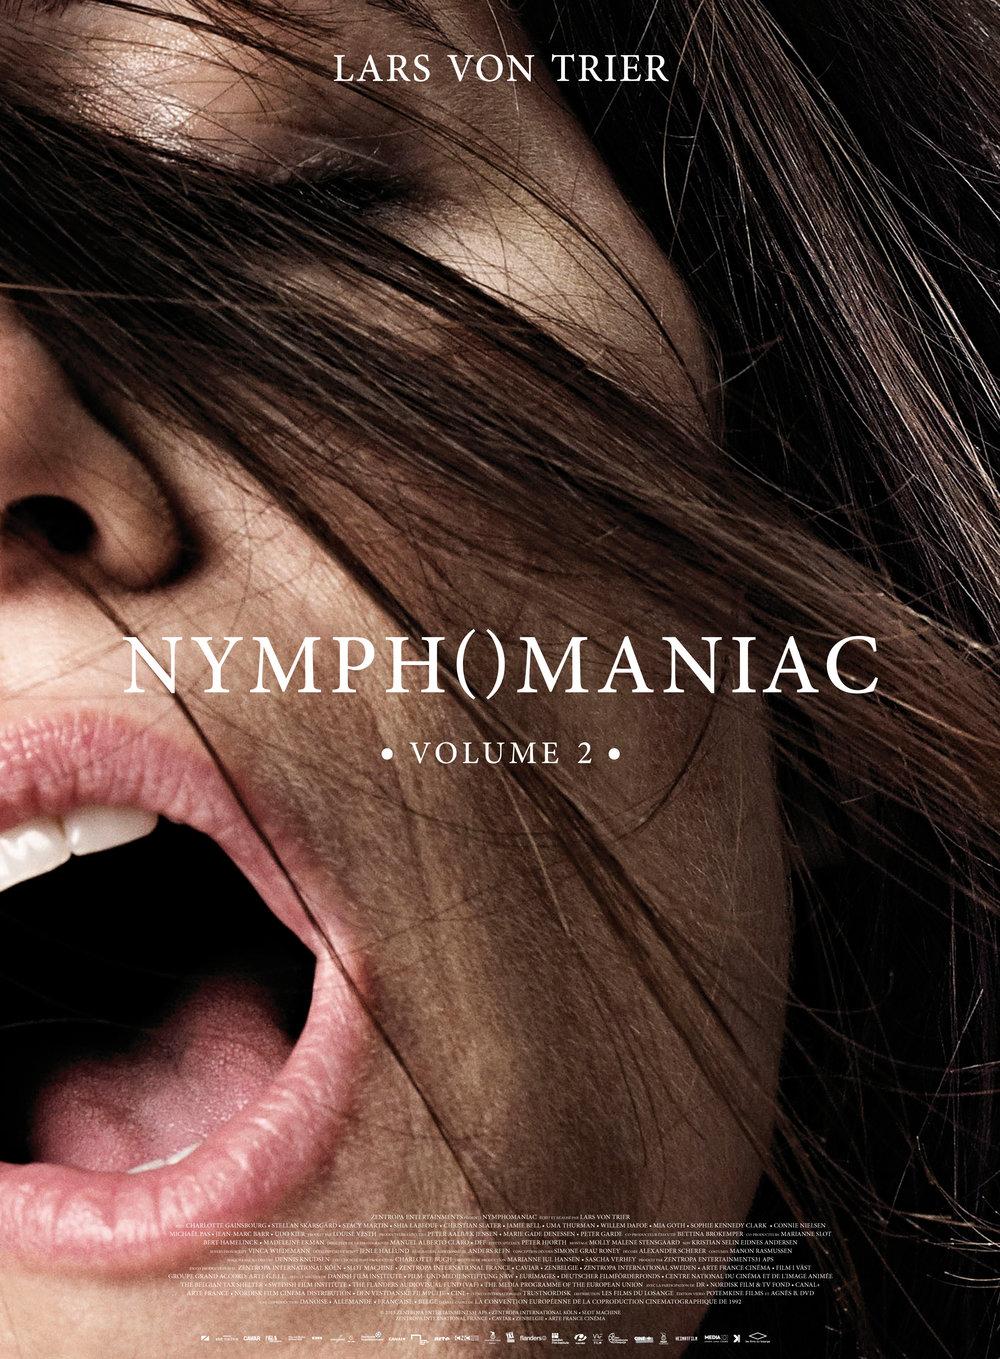 Nymphomaniacvol2.jpg